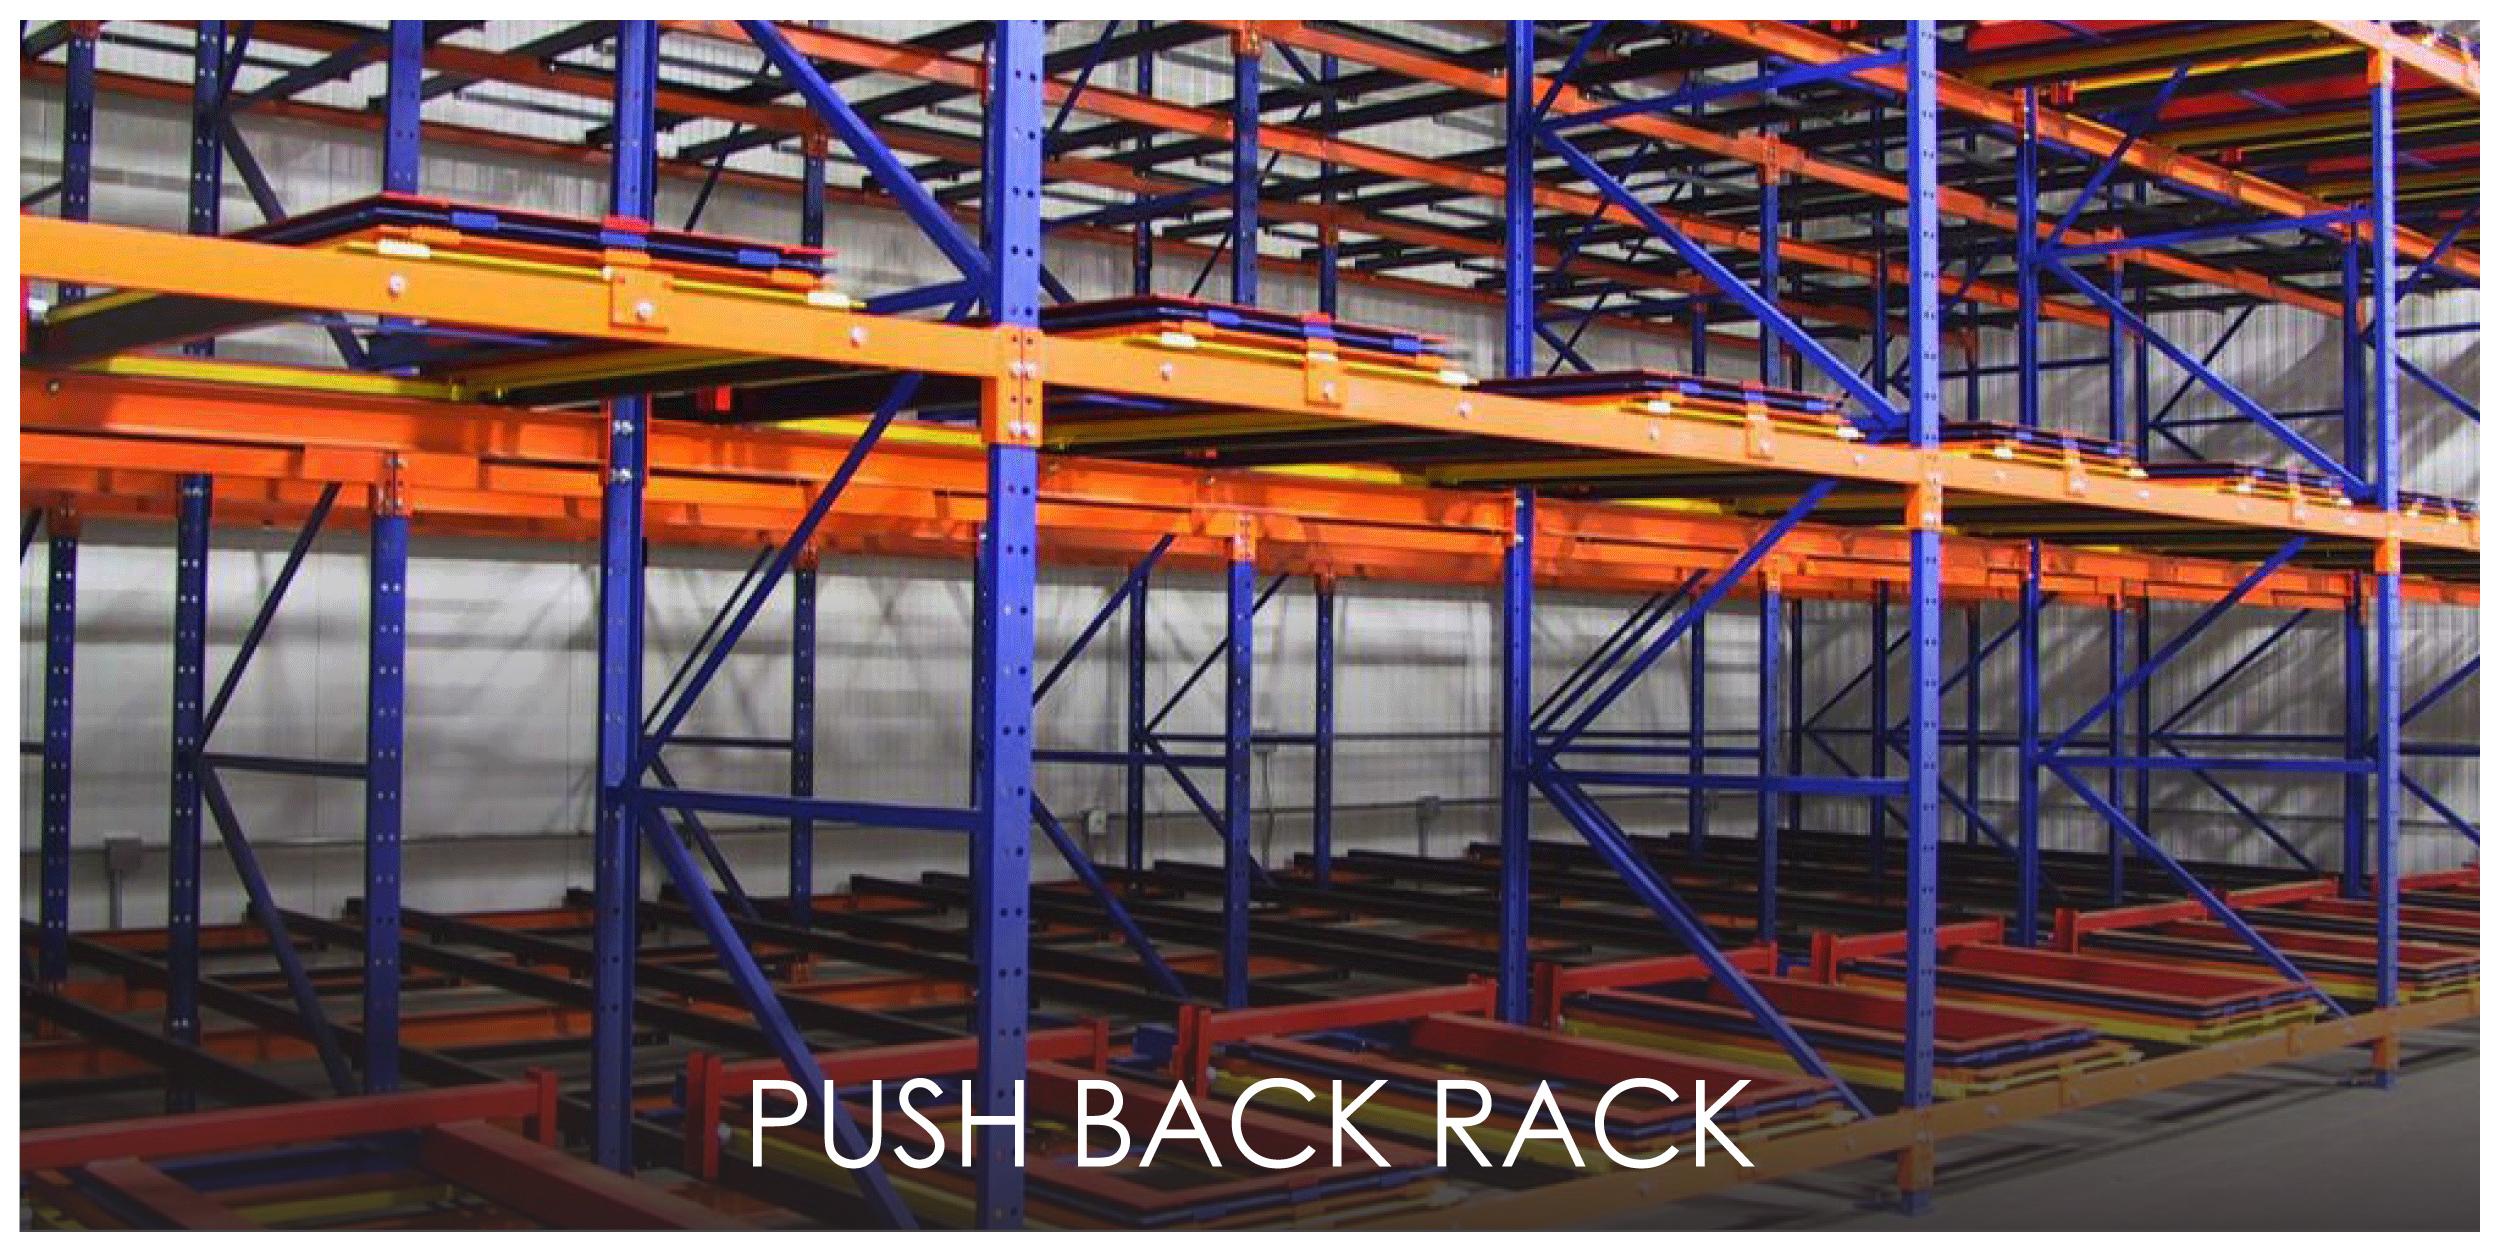 PushBackRack-Front-Page.jpg